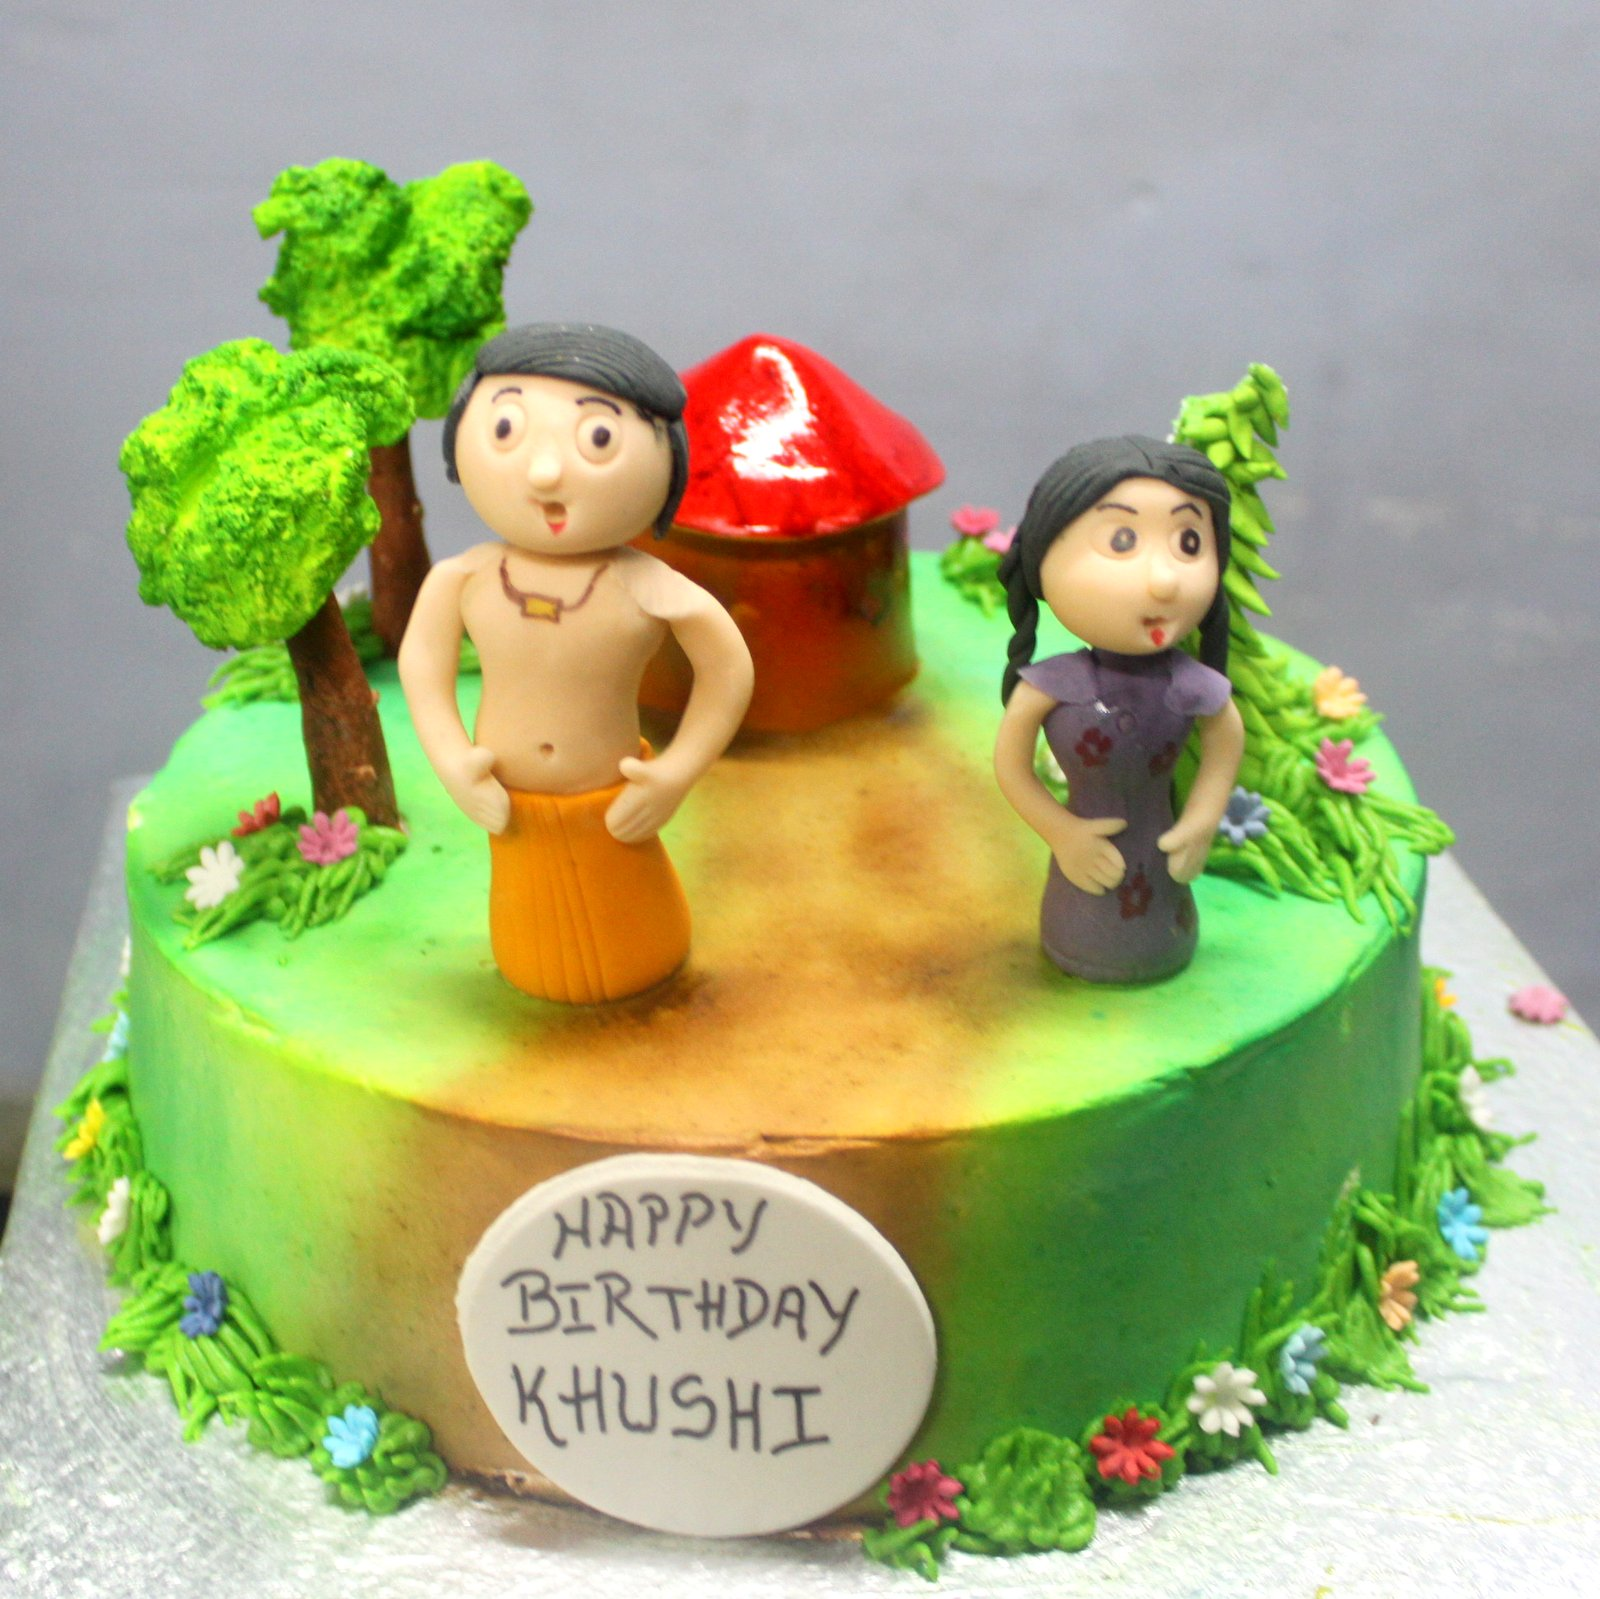 Cake Images Of Chota Bheem : Chotta Bheem Theme Cake Photo Album